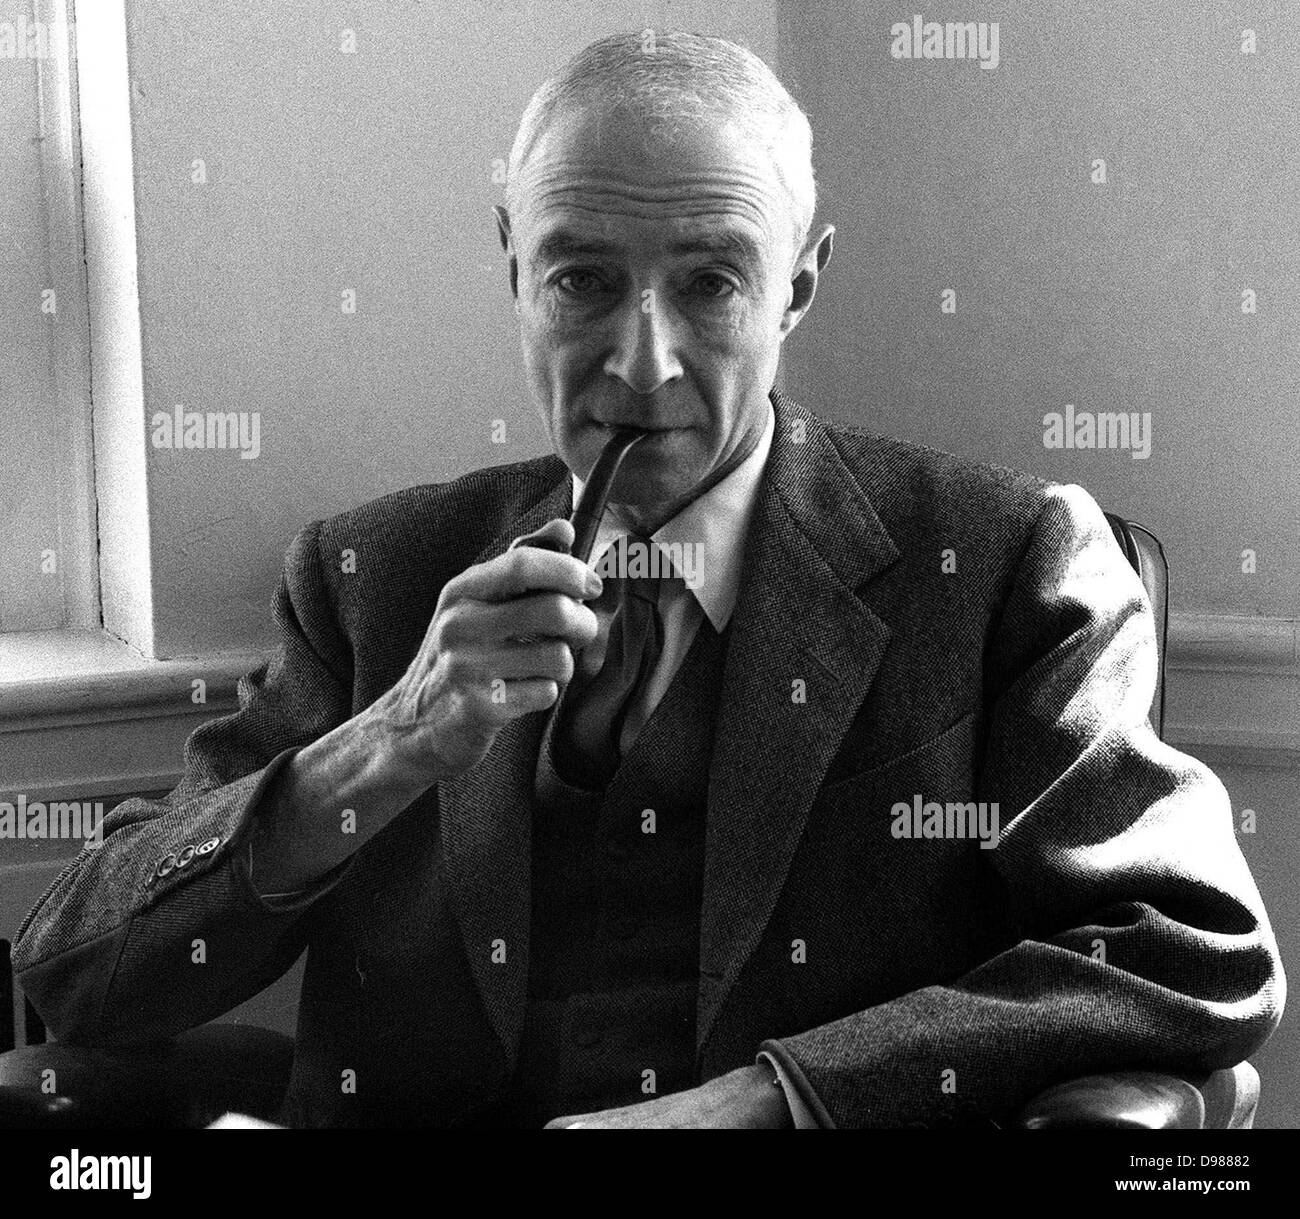 J Robert Oppenheimer 1904 1967 American Theoretical